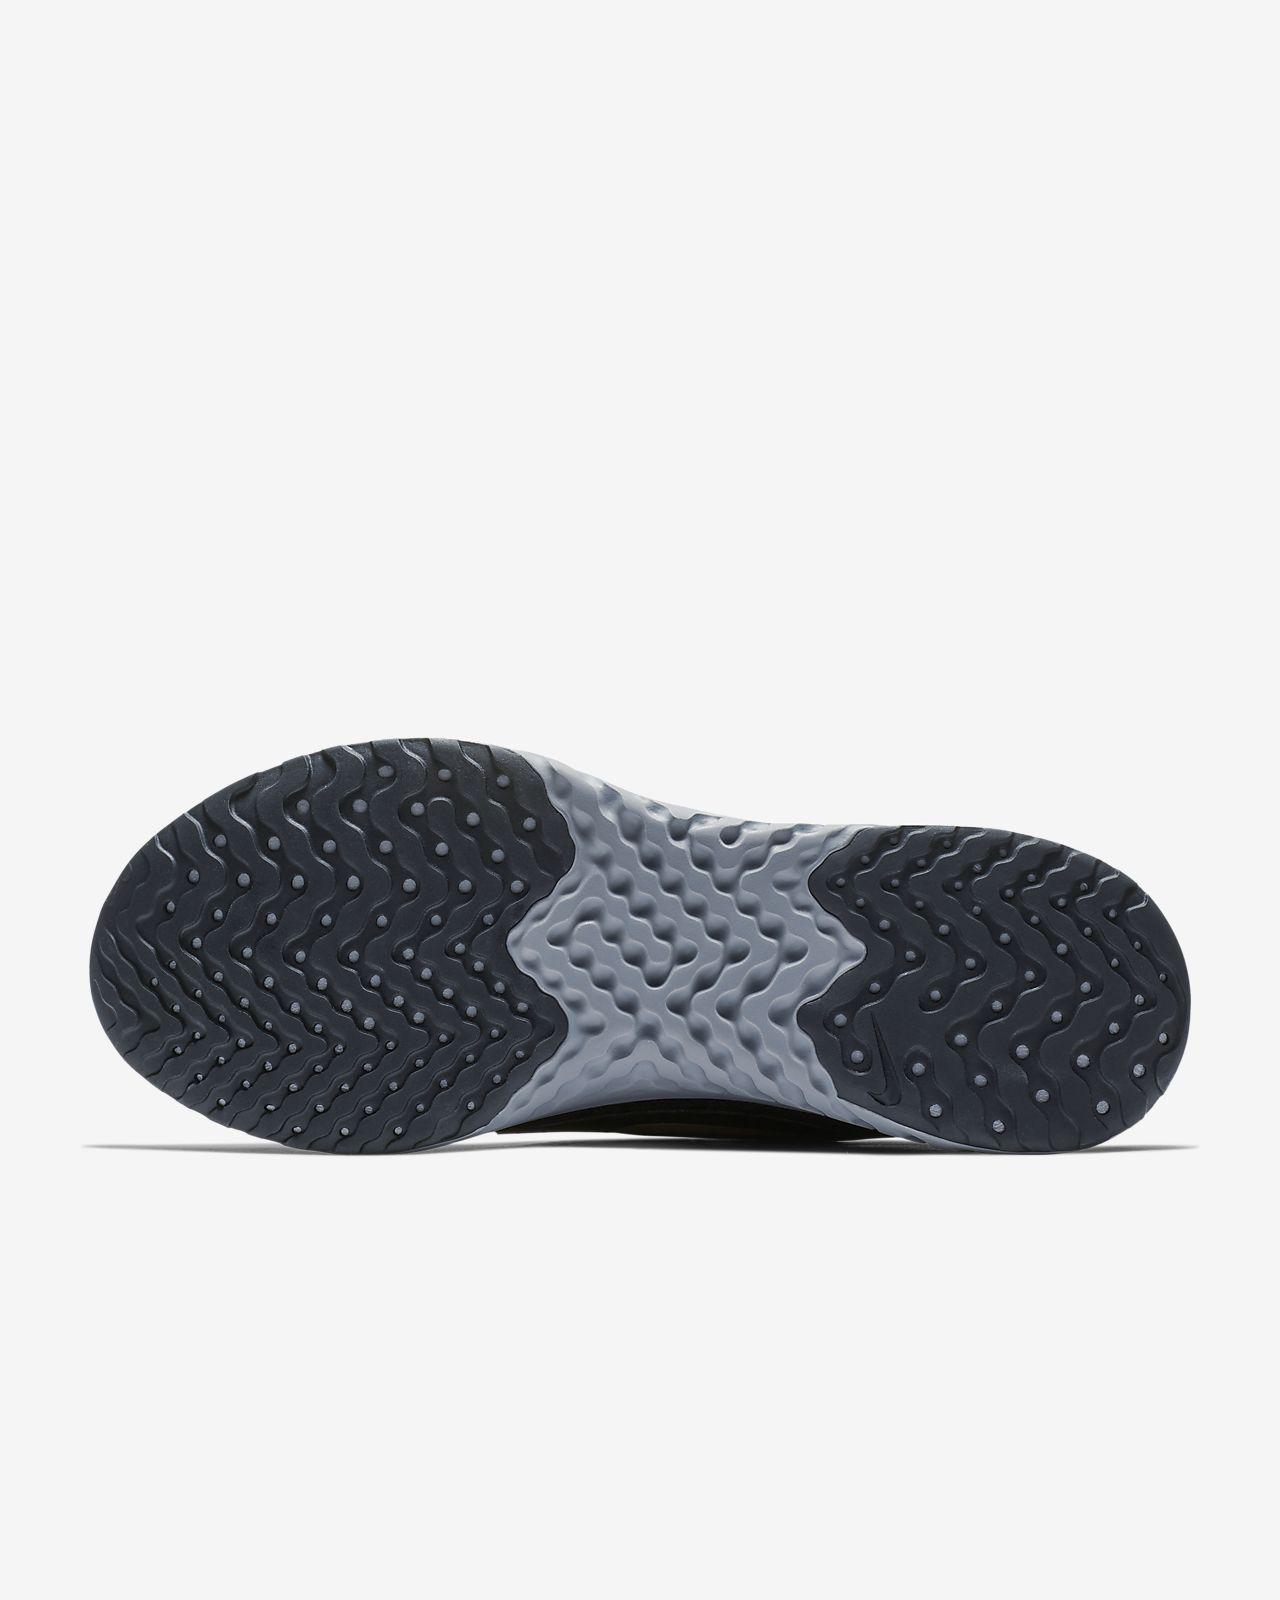 scarpa donna nike legend react nero